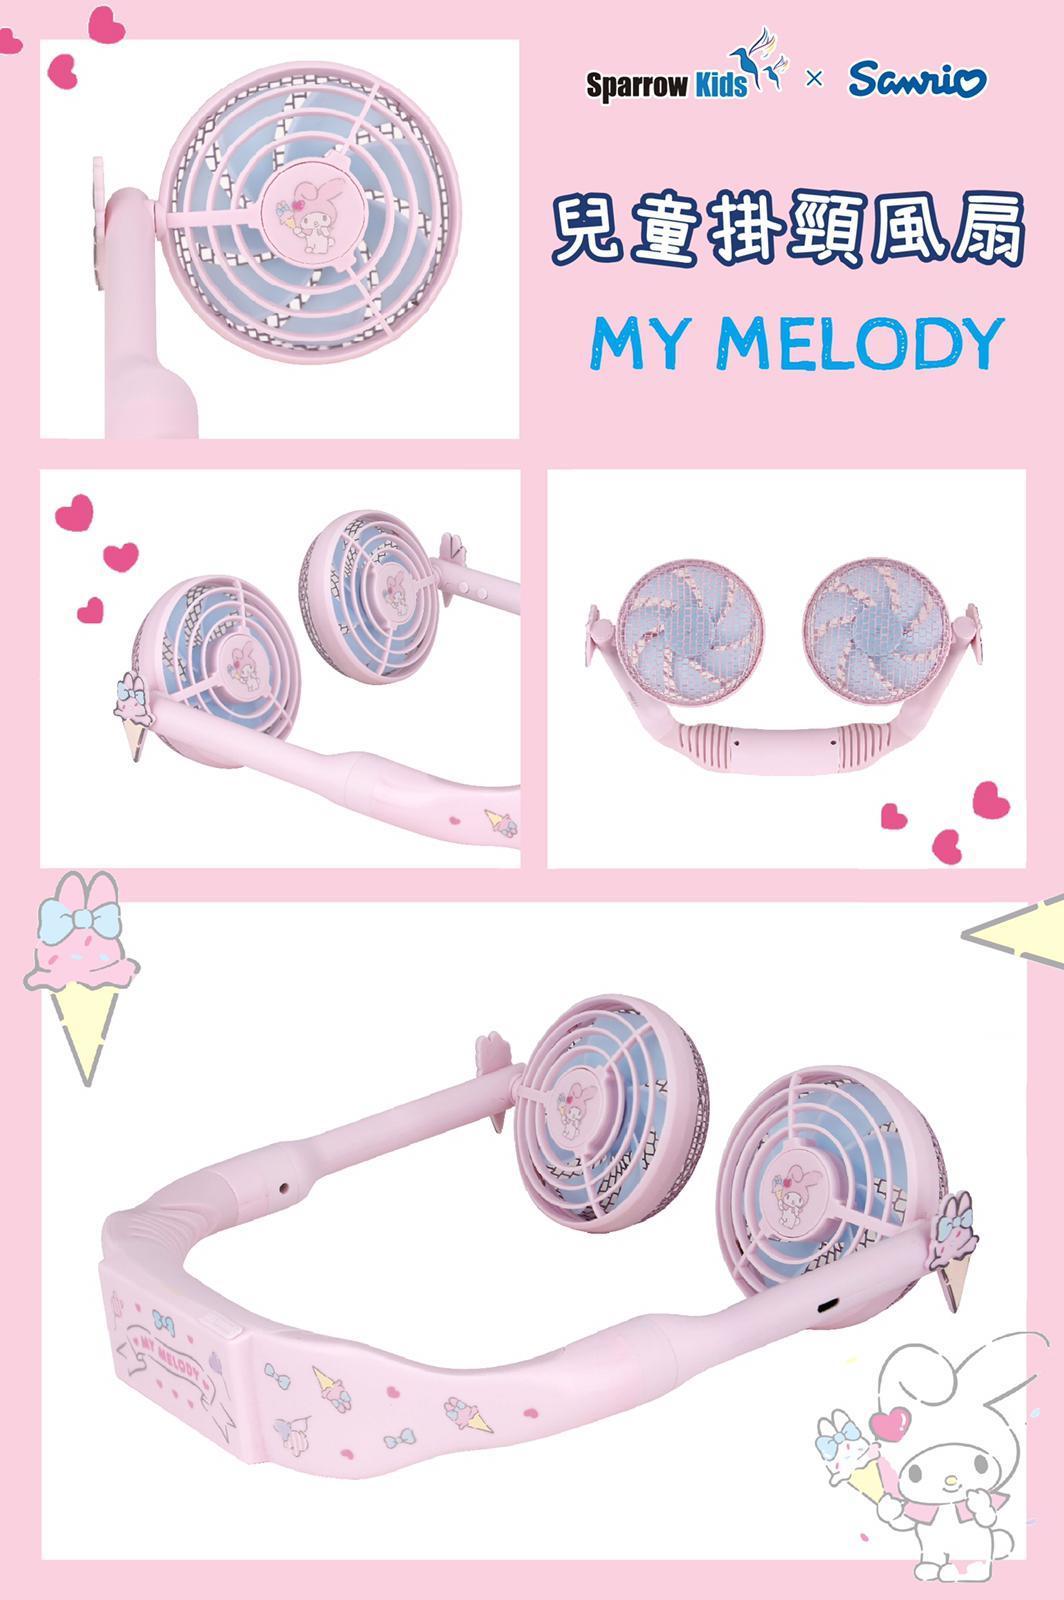 【Sanrio】 兒童卡通掛頸閃燈風扇-My Melody